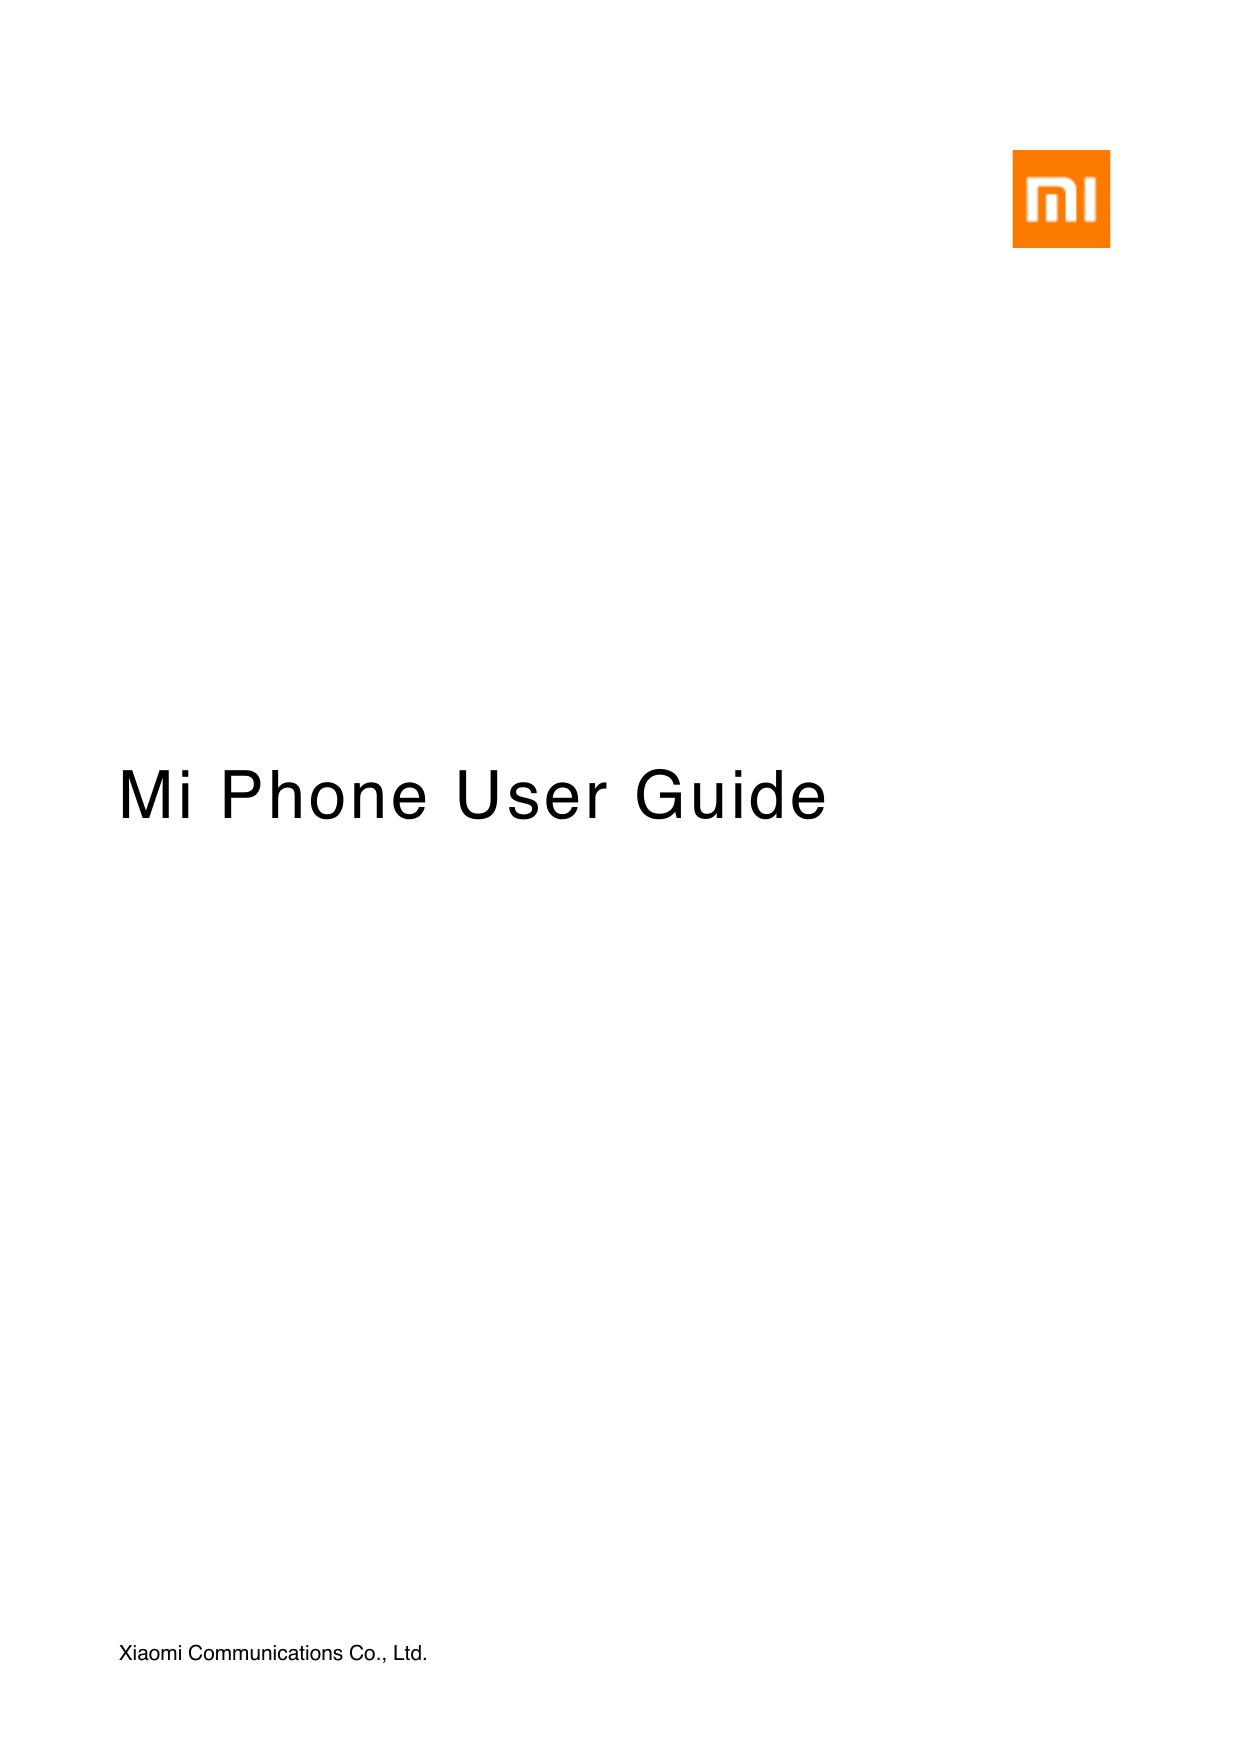 Mi Phone User Guide | manualzz com